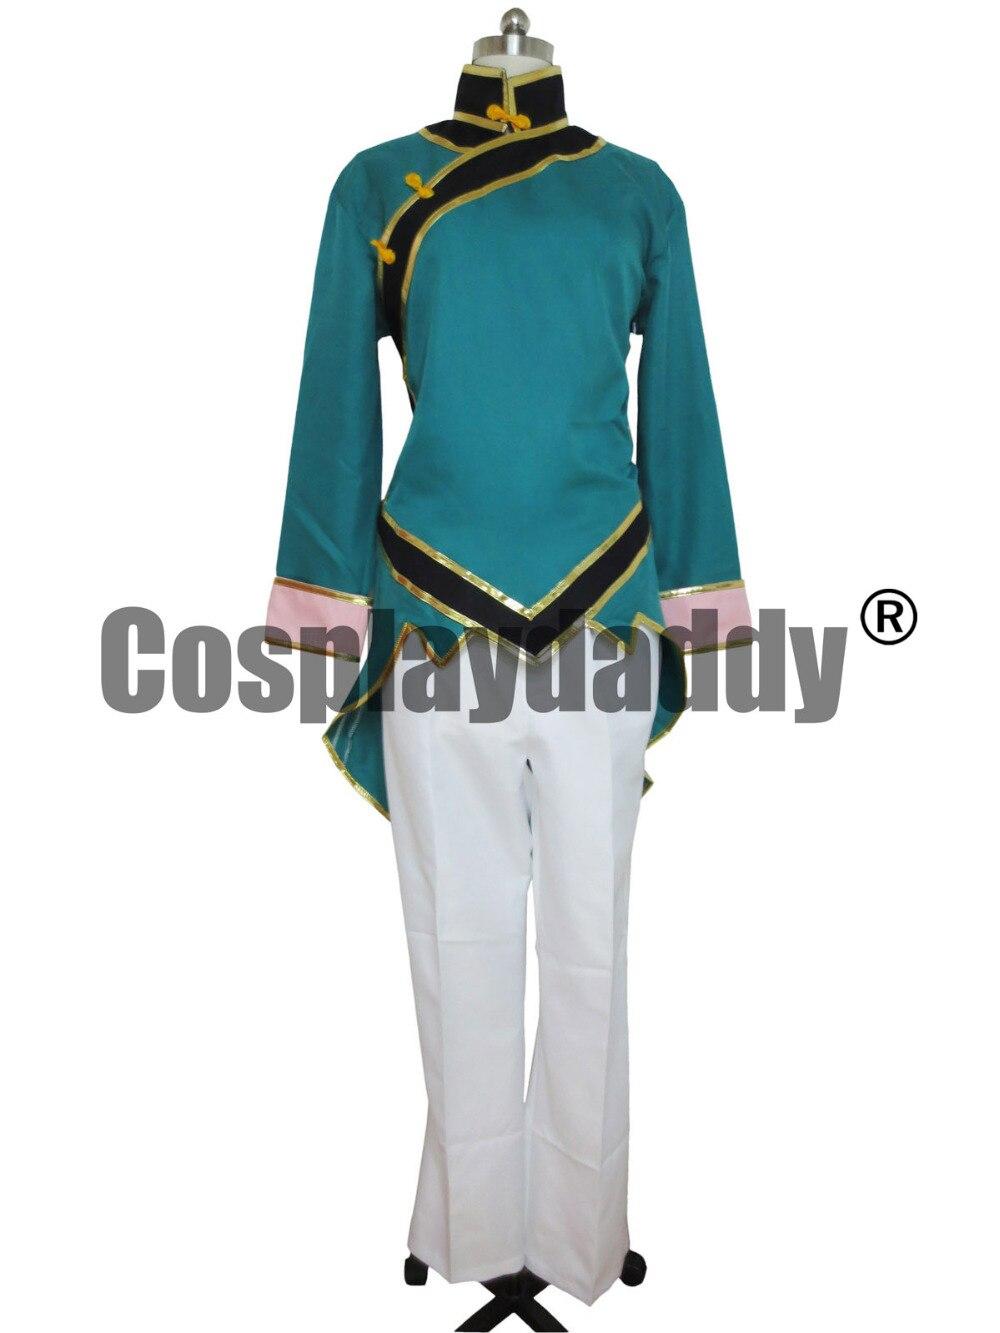 RWBY Beacon Academy Team Lie Ren Green Cosplay Costume Whole Set S002